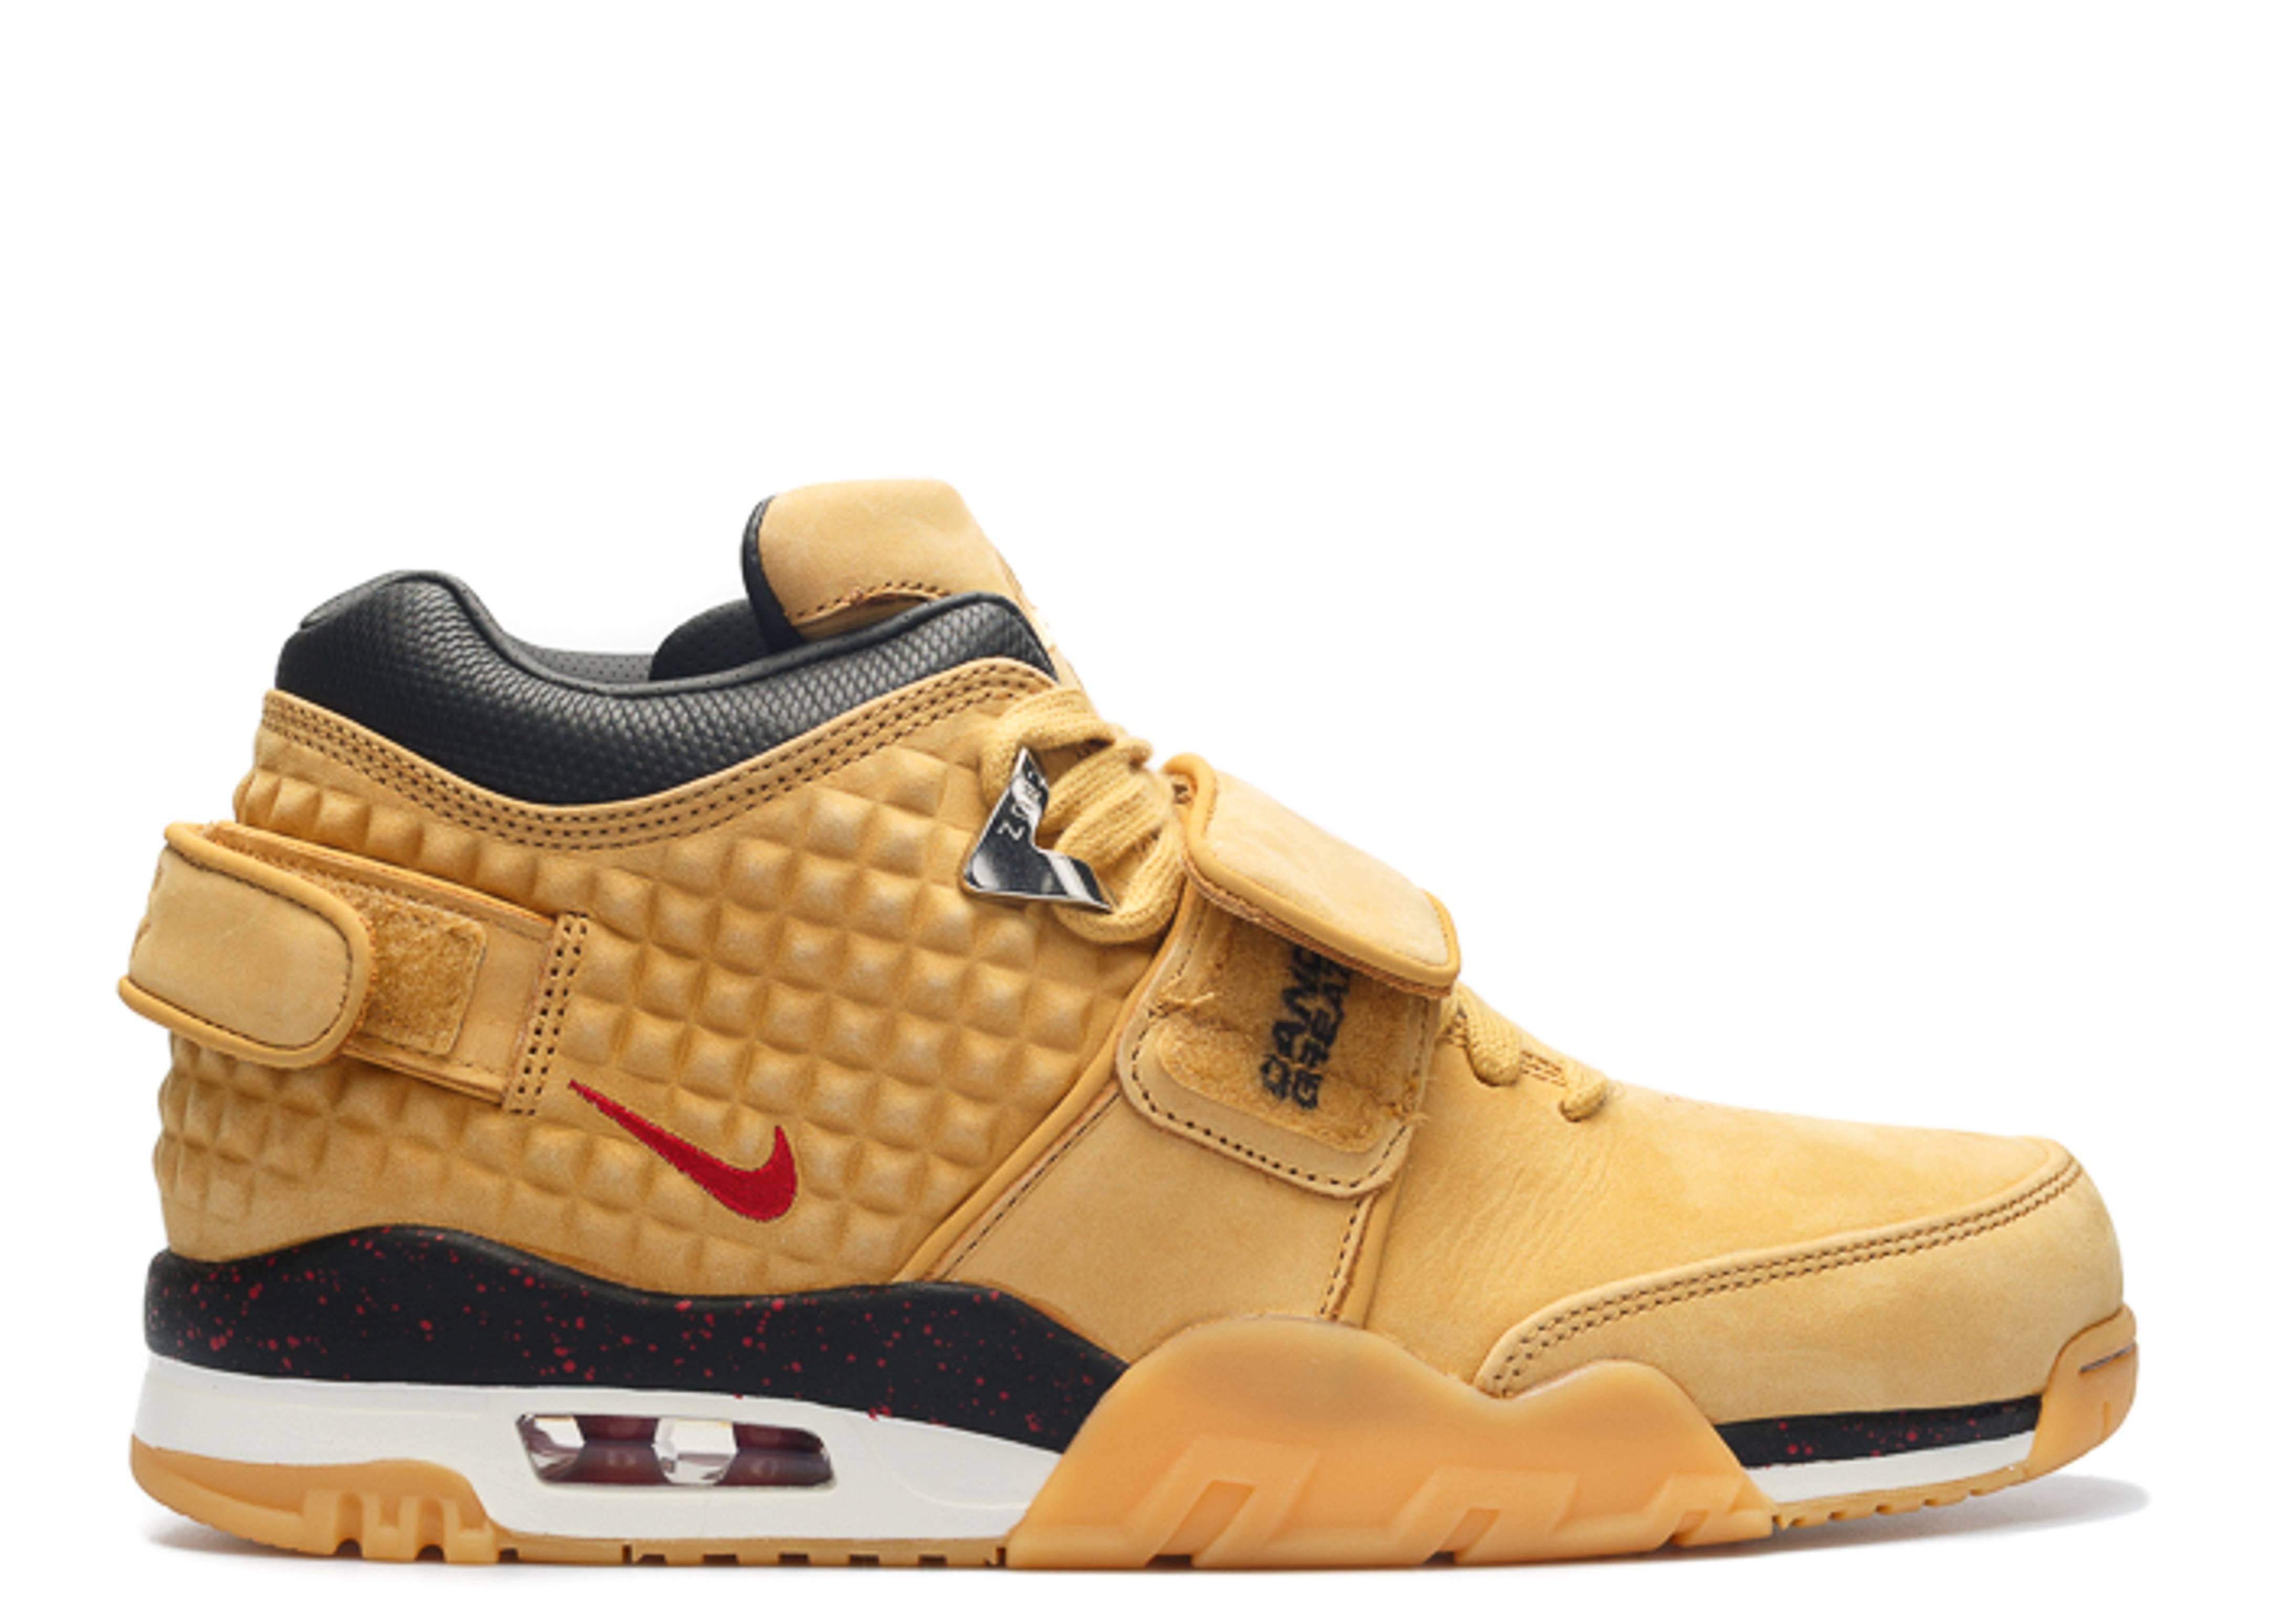 NIKE AIR TR.V.CRUZ PRM 812637-700 sneaker WHEAT US 10.5